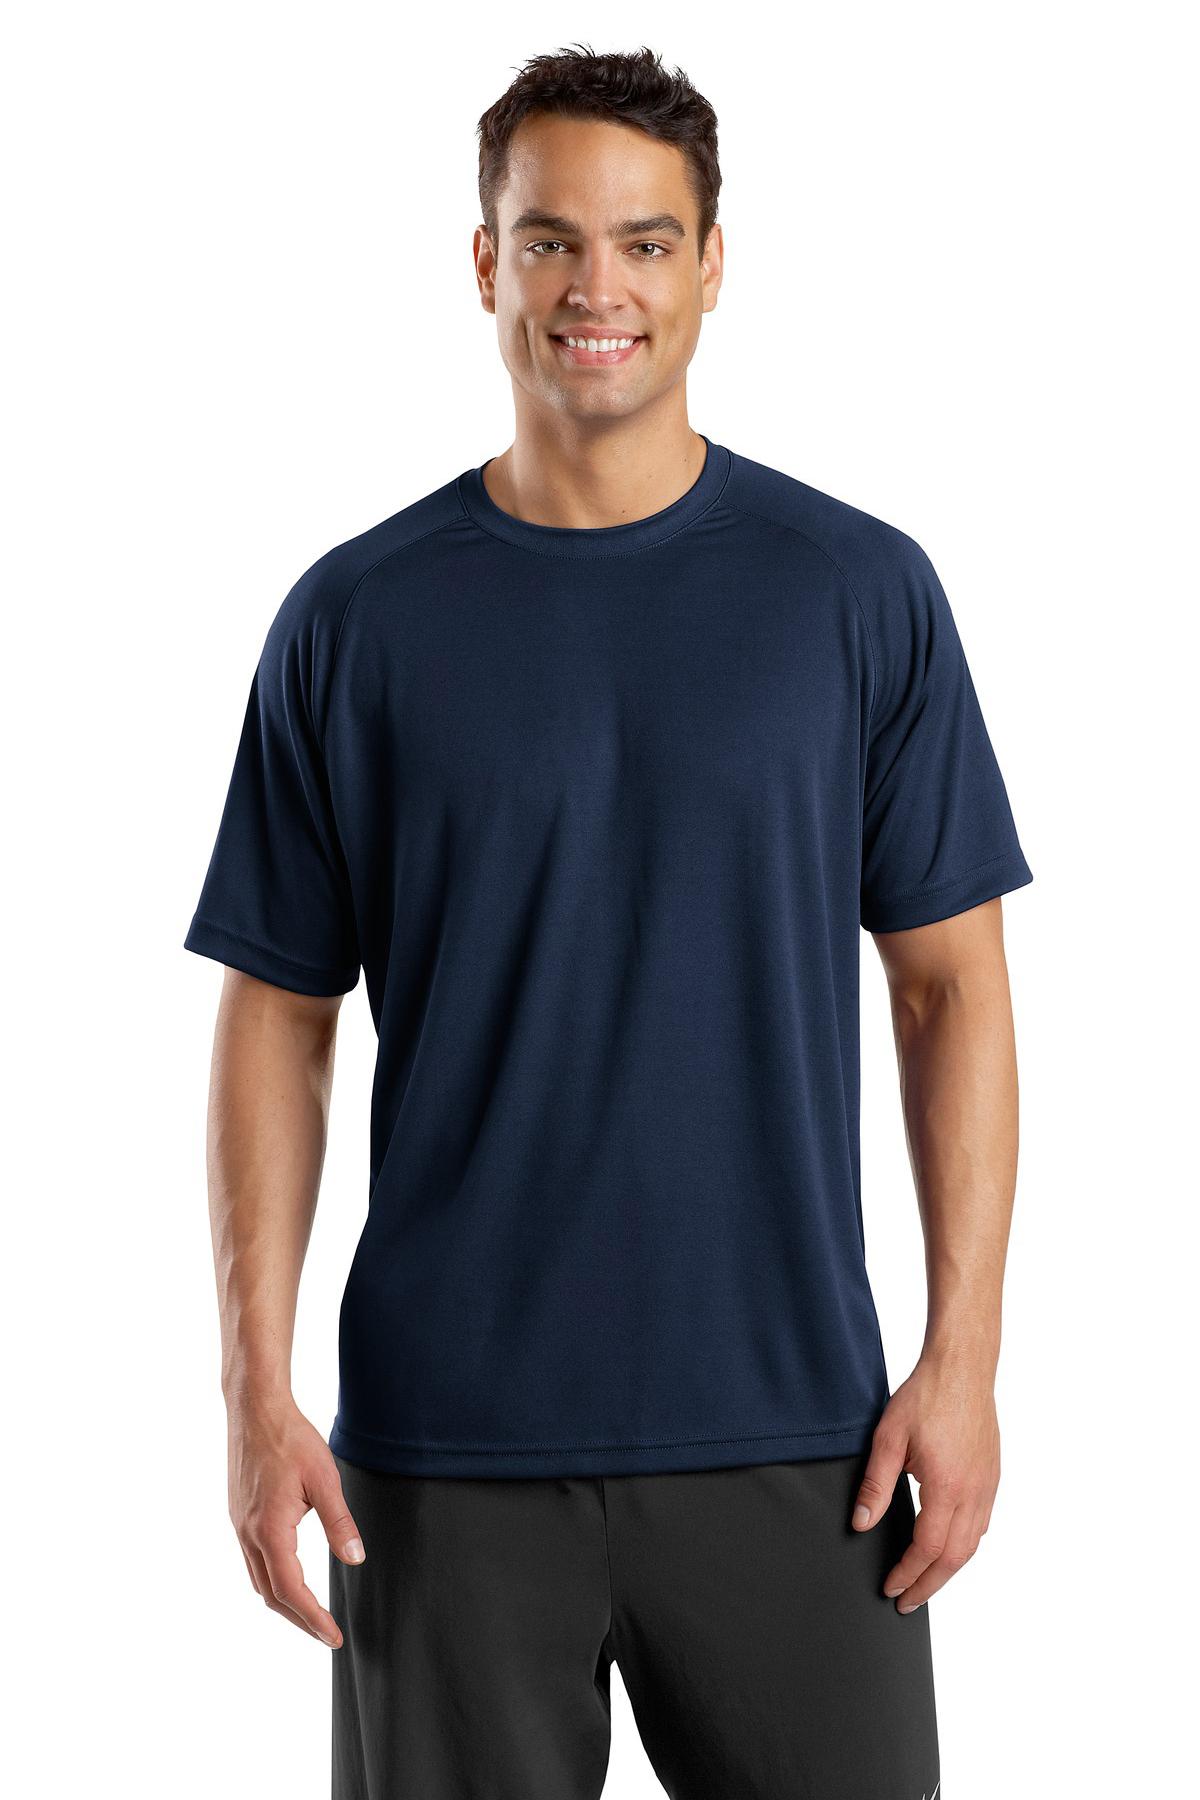 T-Shirts-Performance-37